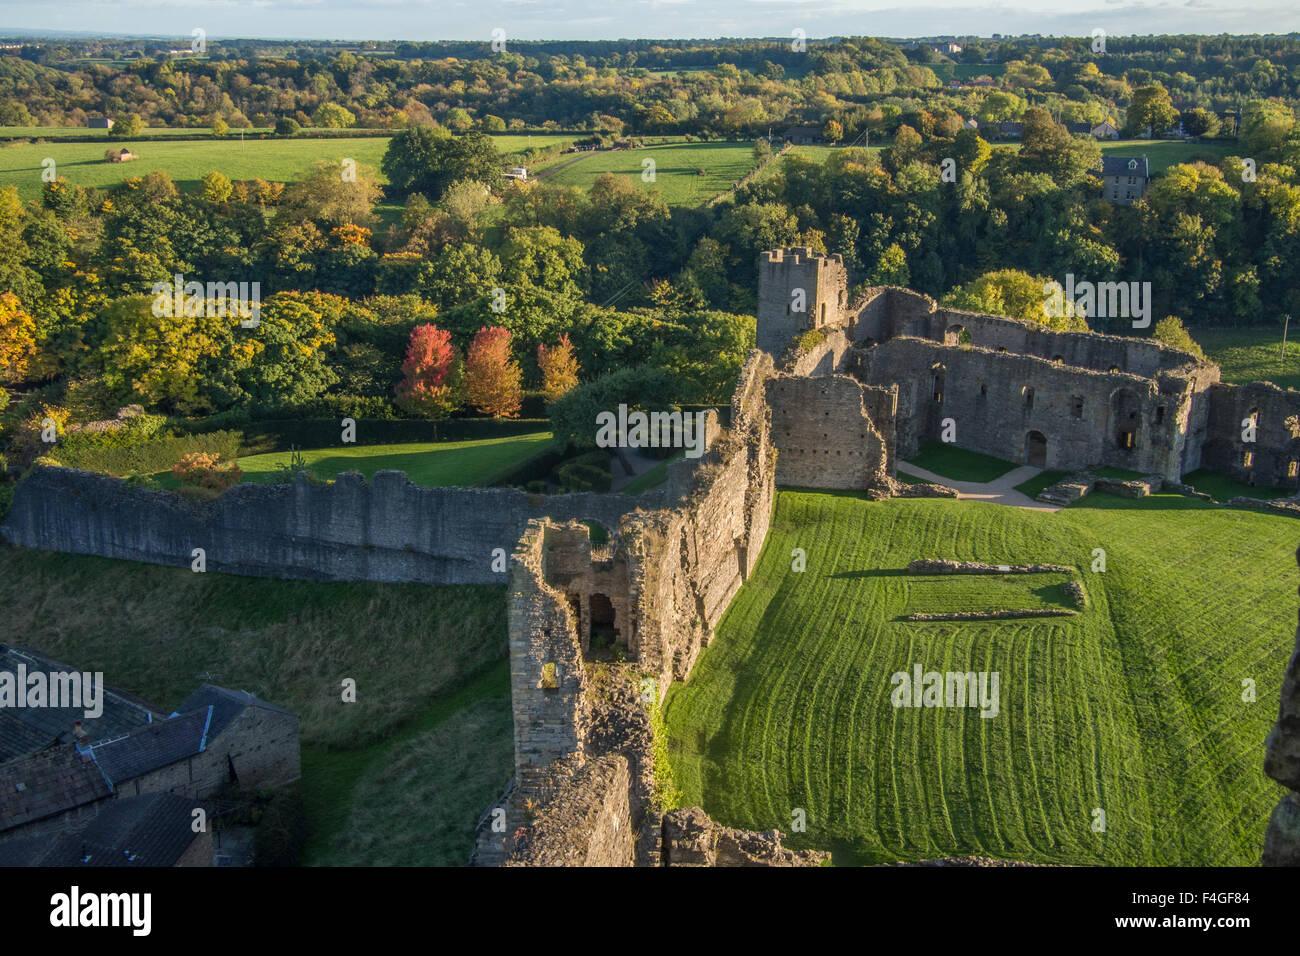 Richmond Castle, Richmond, Richmondshire, North Yorkshire, England. - Stock Image